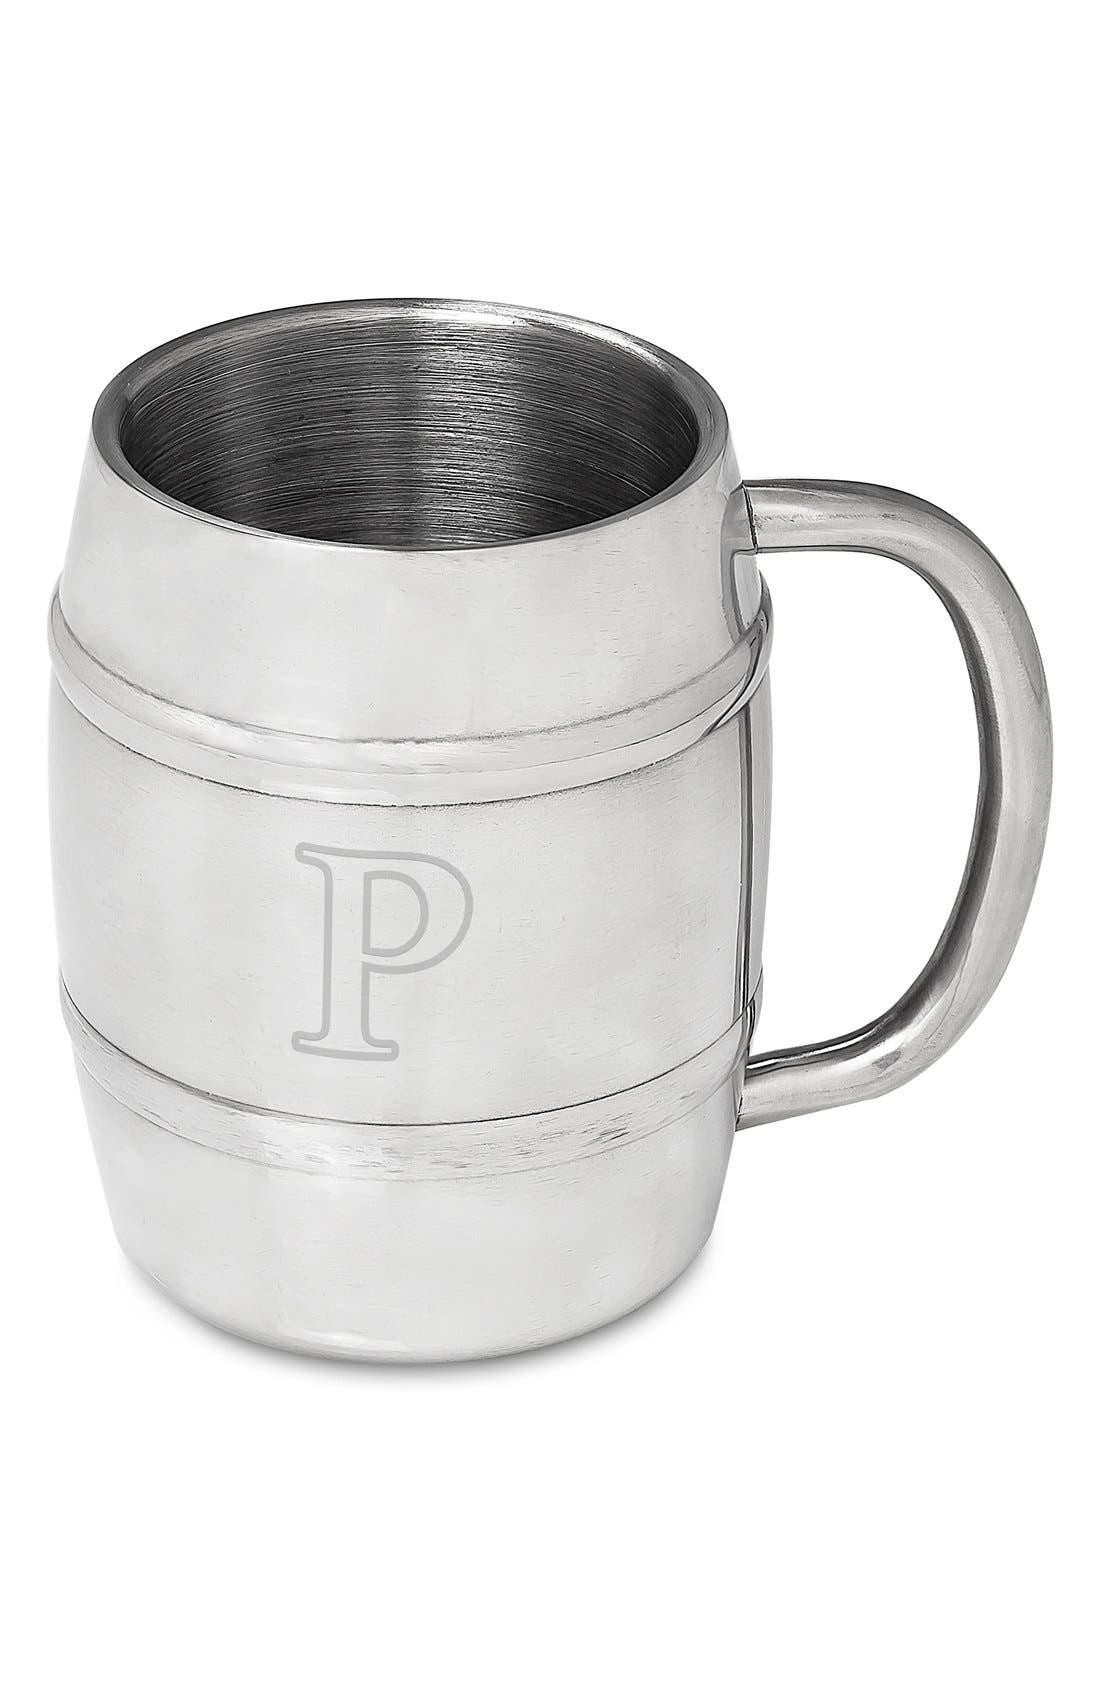 Monogram Stainless Steel Keg Mug,                             Main thumbnail 18, color,